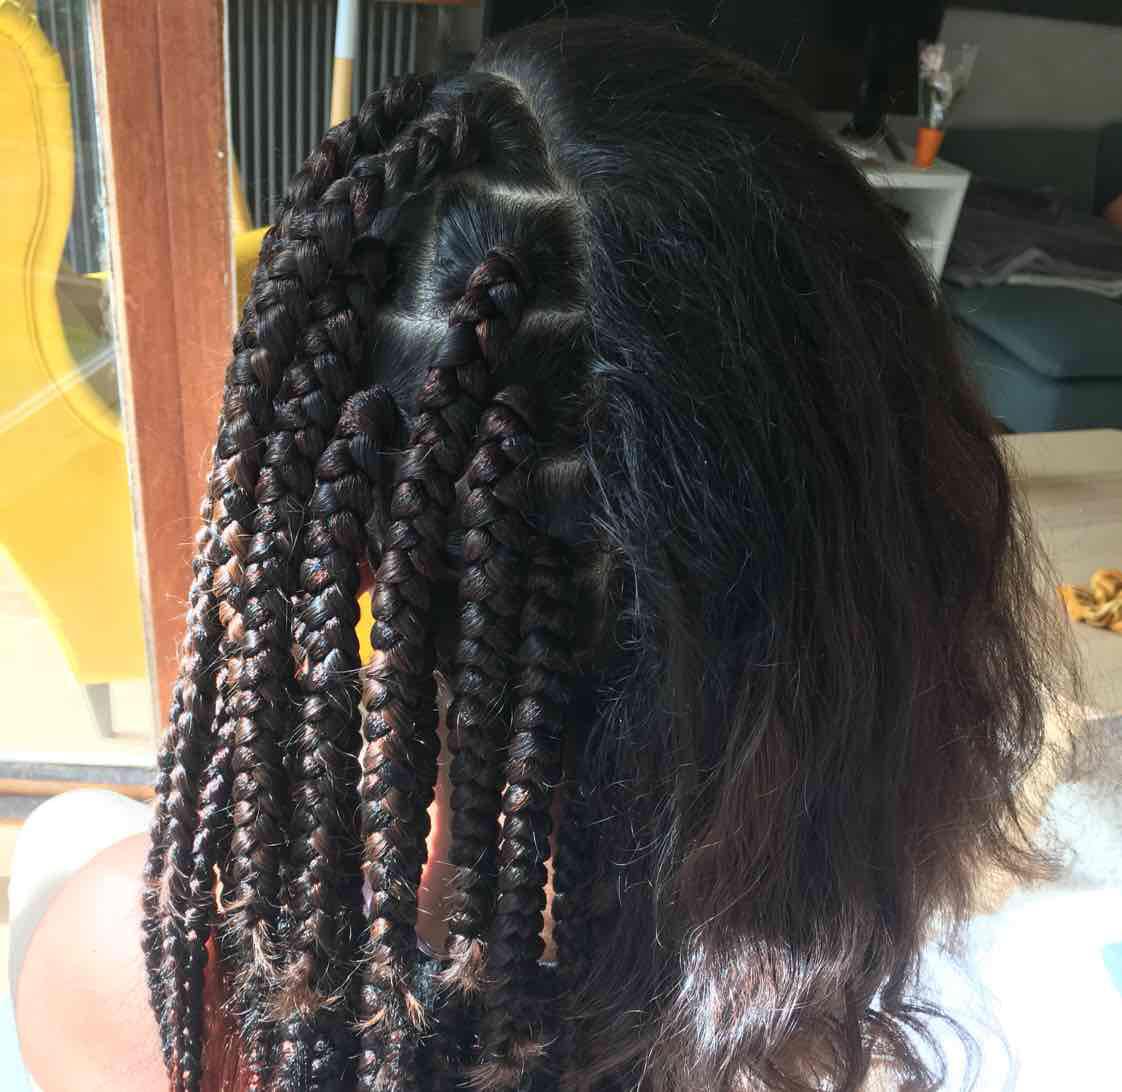 salon de coiffure afro tresse tresses box braids crochet braids vanilles tissages paris 75 77 78 91 92 93 94 95 SOQQJURQ